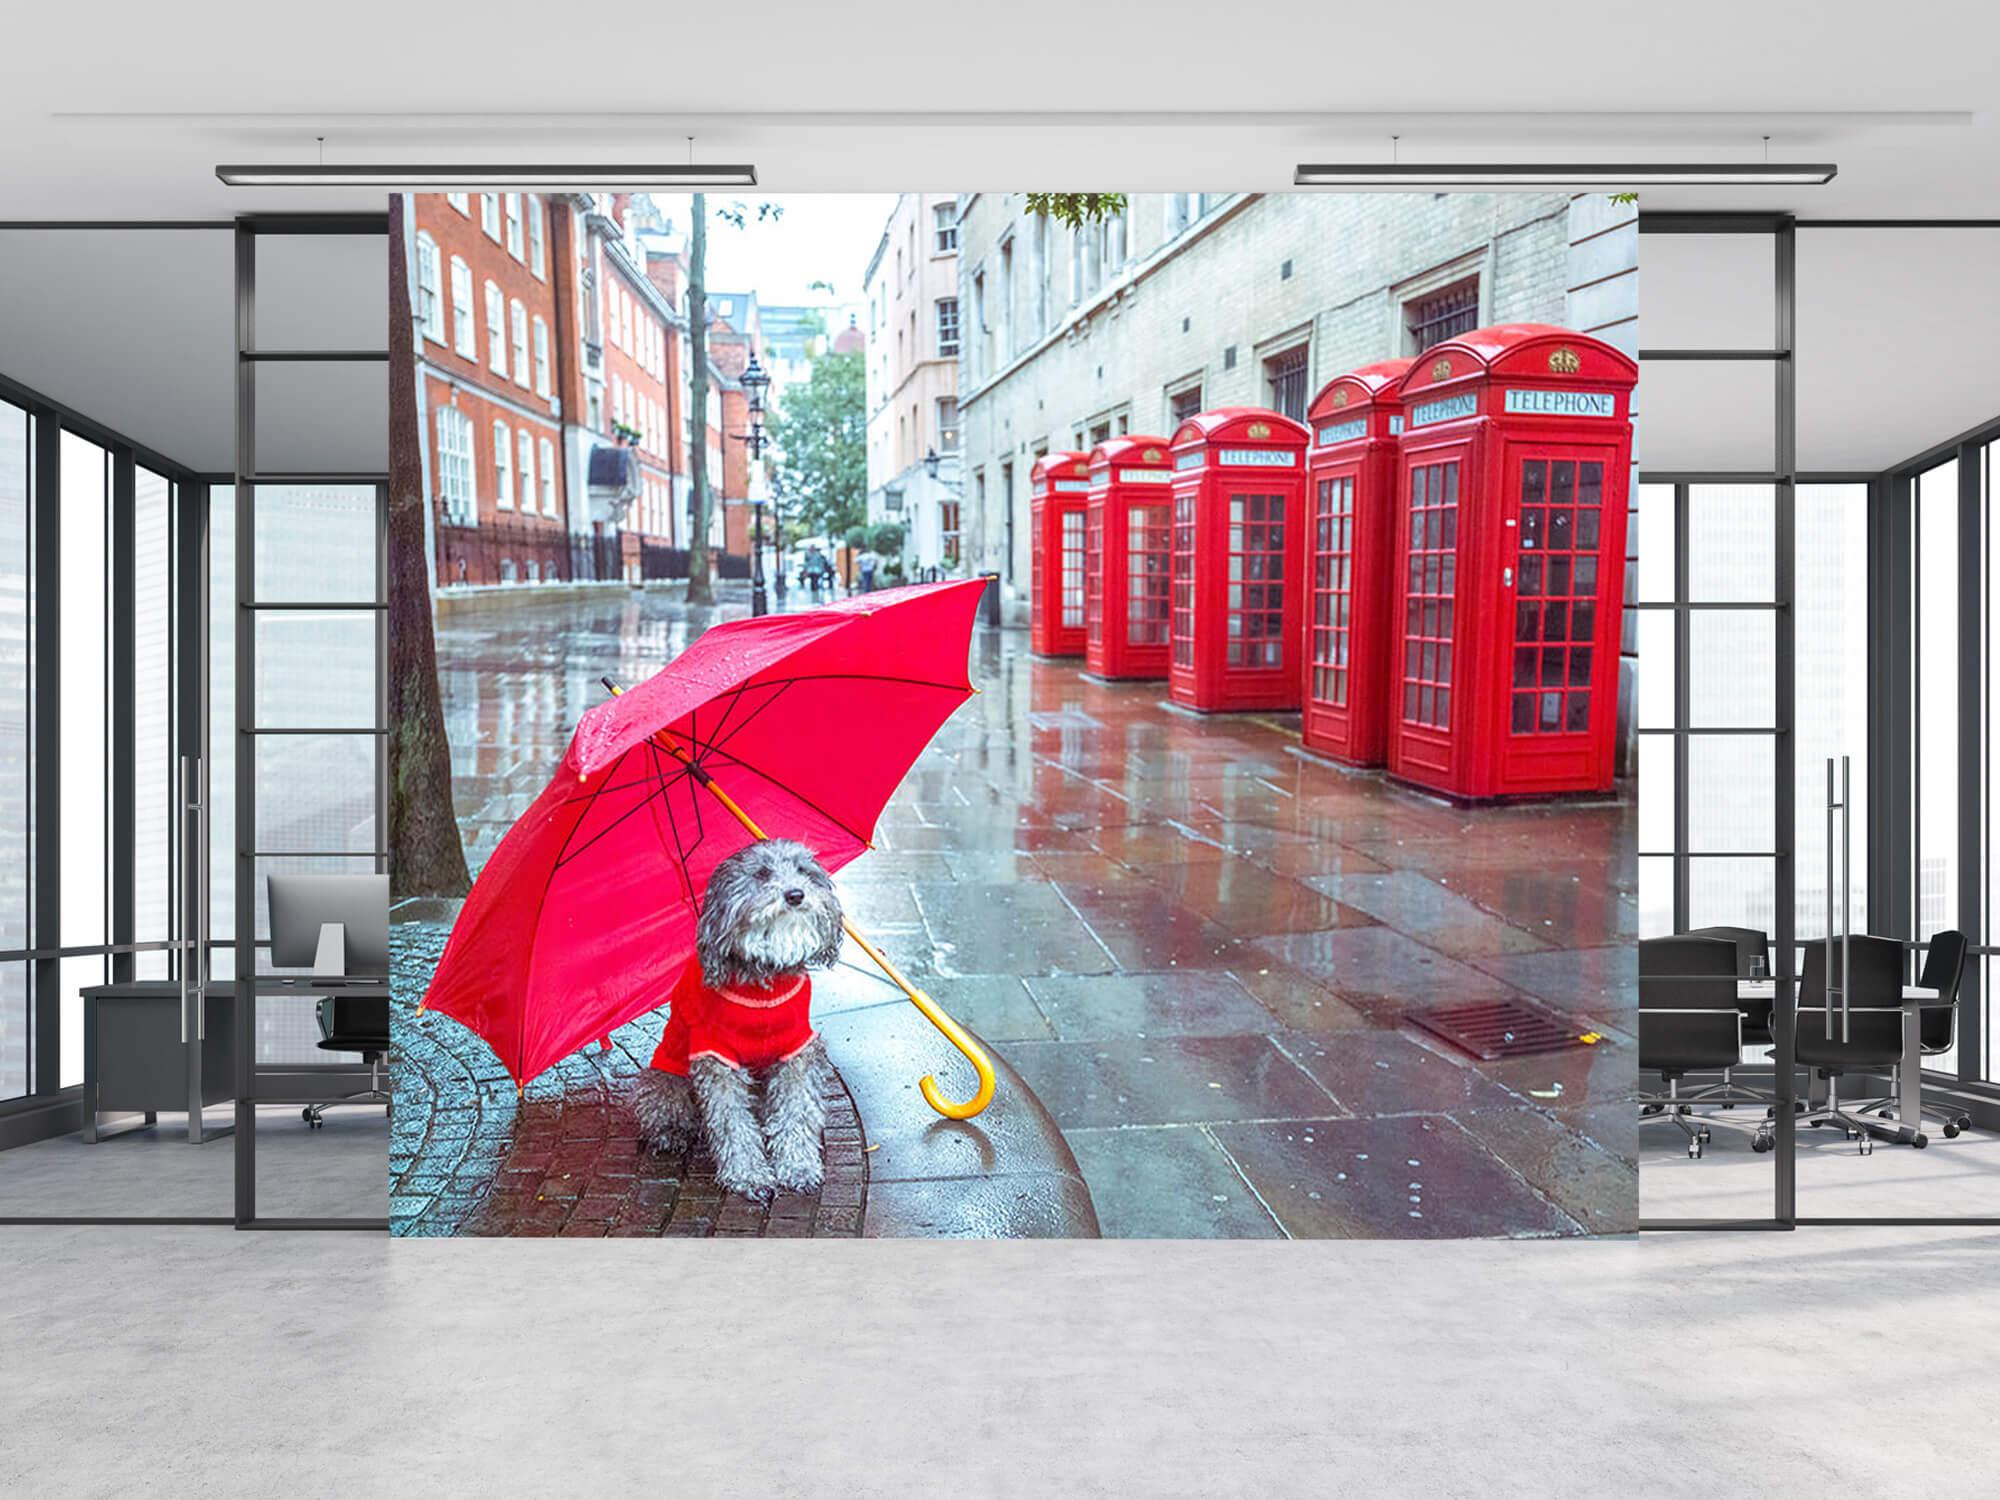 Dog with umbrella 2